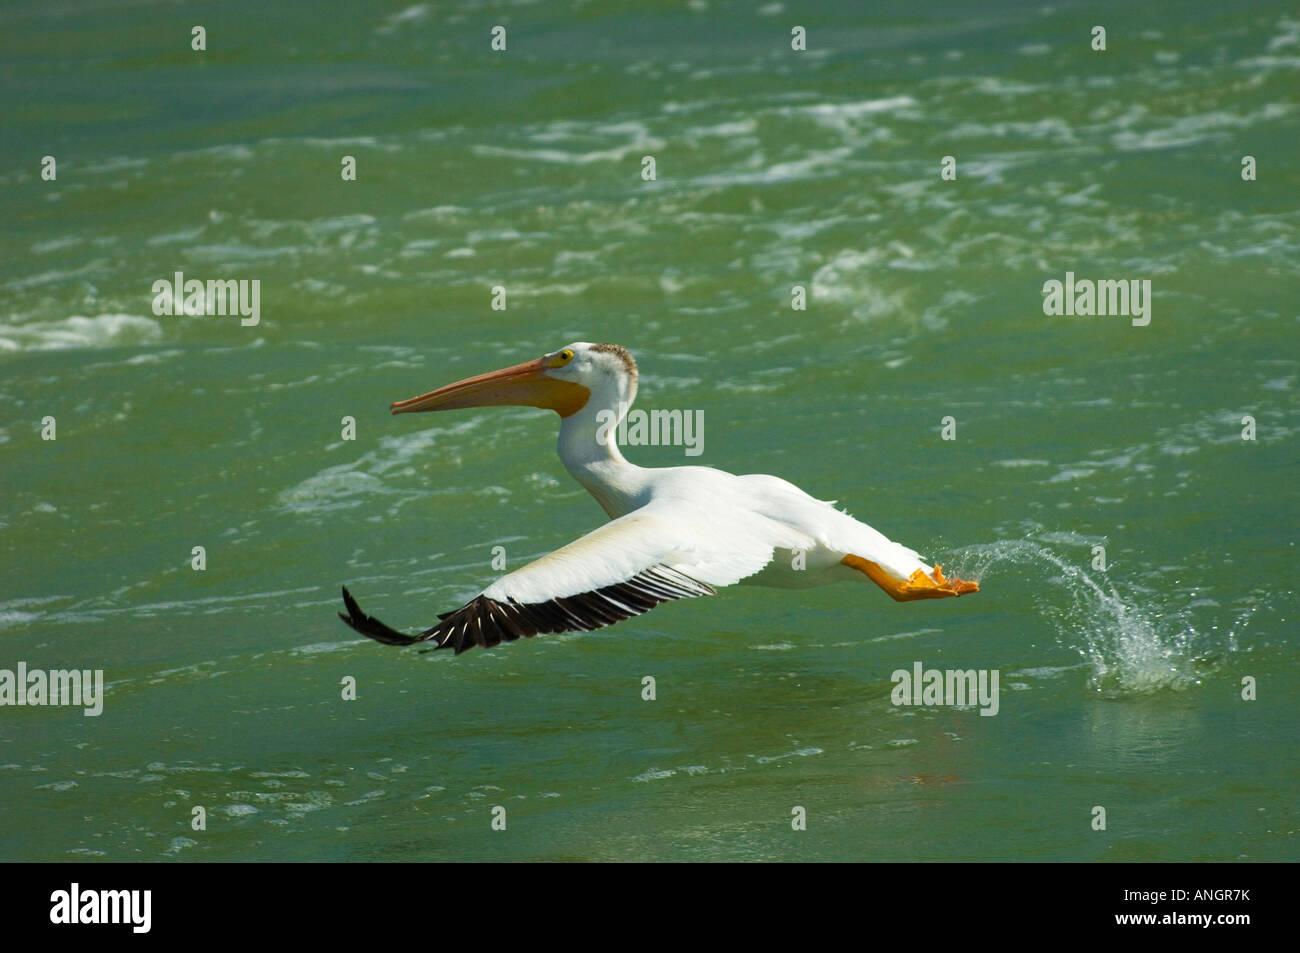 White pelican taking flight, Fairford, Manitoba, Canada. - Stock Image